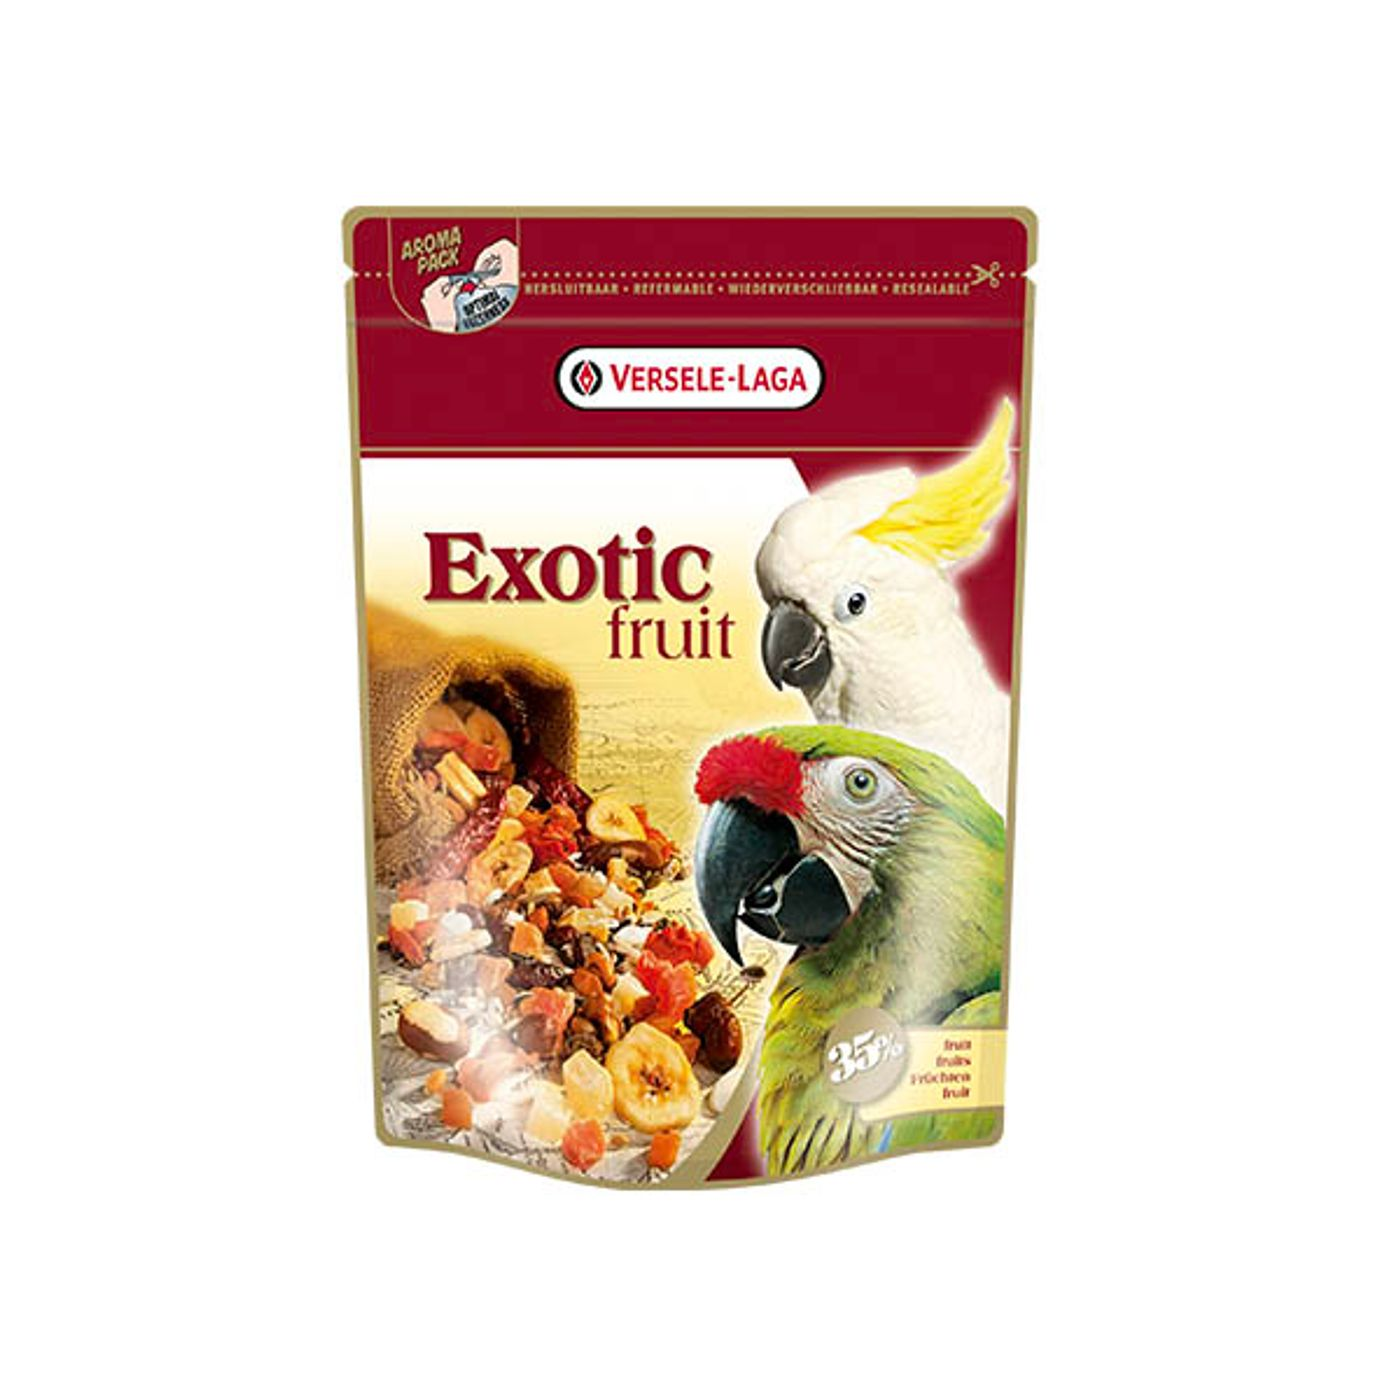 Versele-Laga-Exotic-Fruit